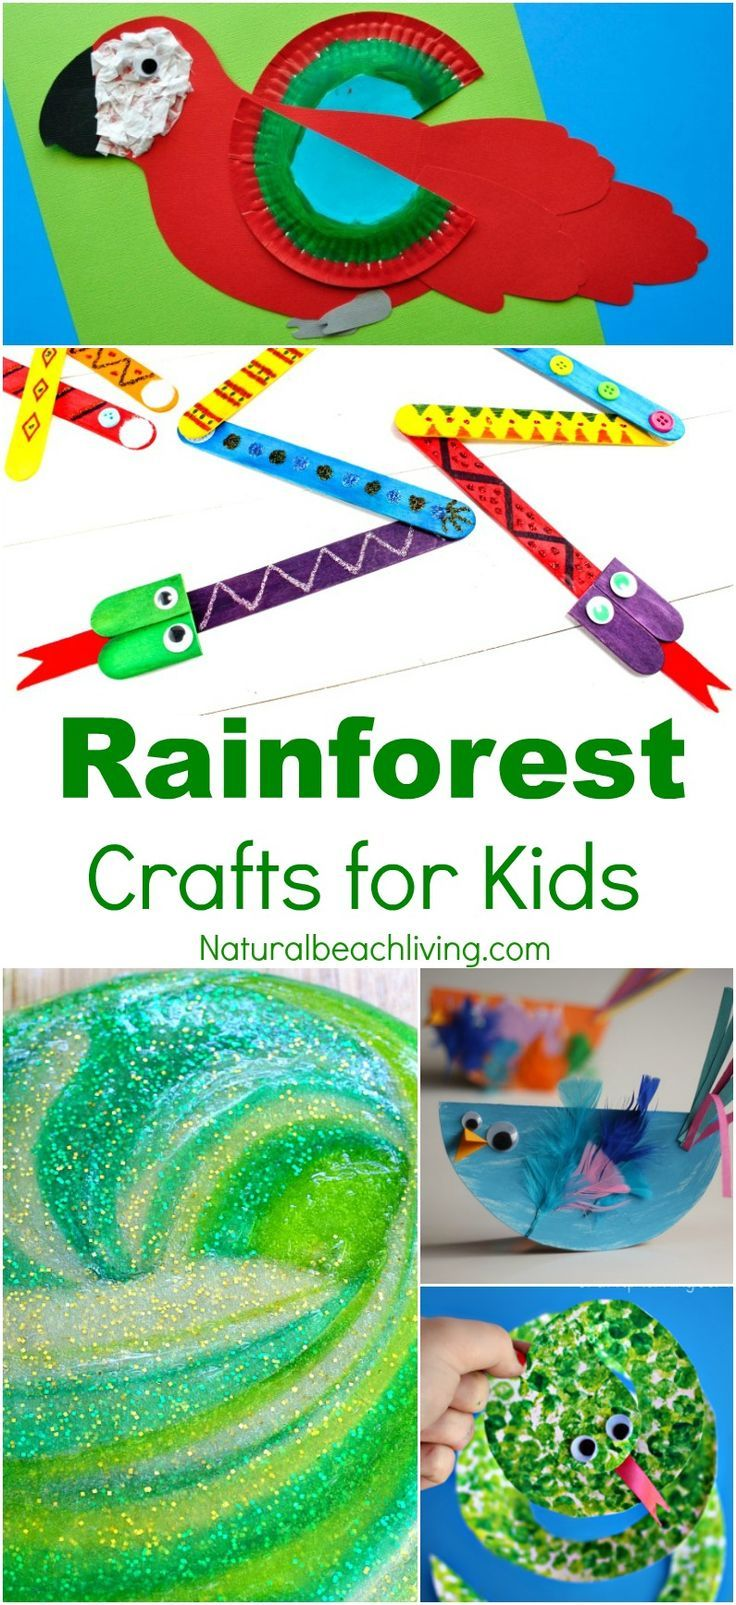 10+ Amazing Rainforest Crafts Kids Can Make, Rainforest and Jungle Slime, Paper Plate Monkey Craft, Rain Stick, Rainforest Preschool Theme, Crafts for Kids